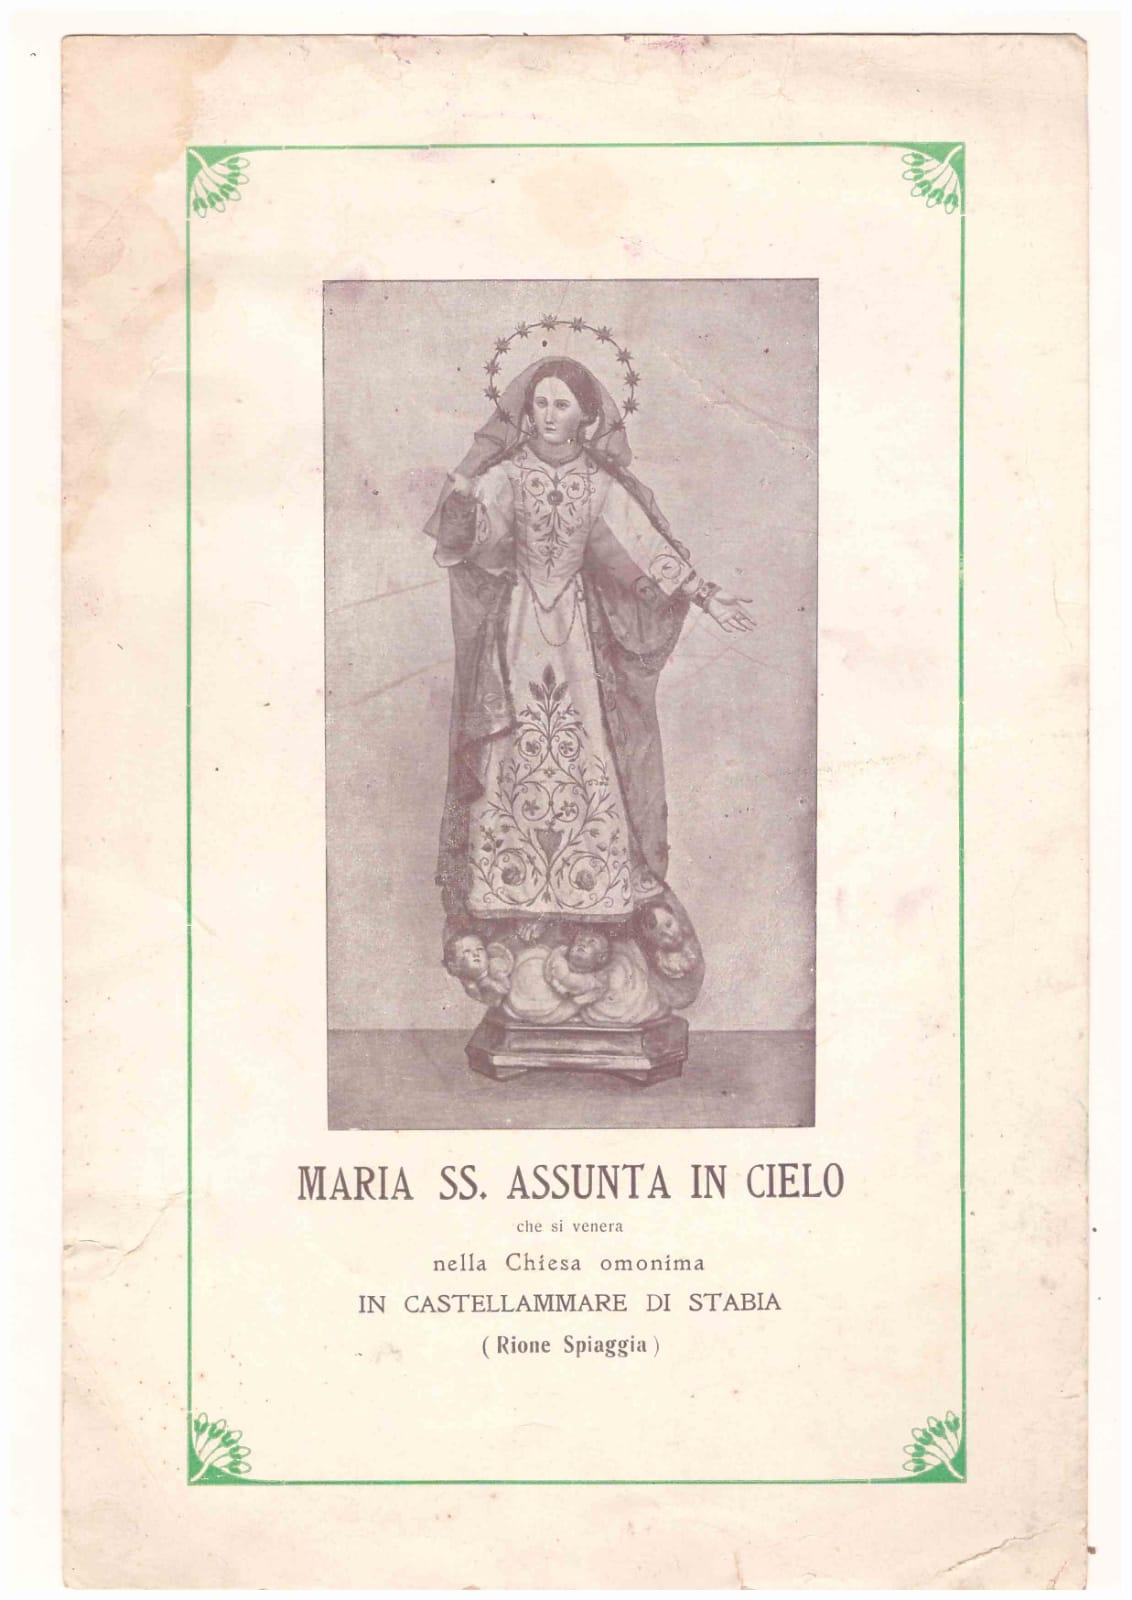 Maria SS. Assunta in Cielo (coll. Gaetano Fontana)